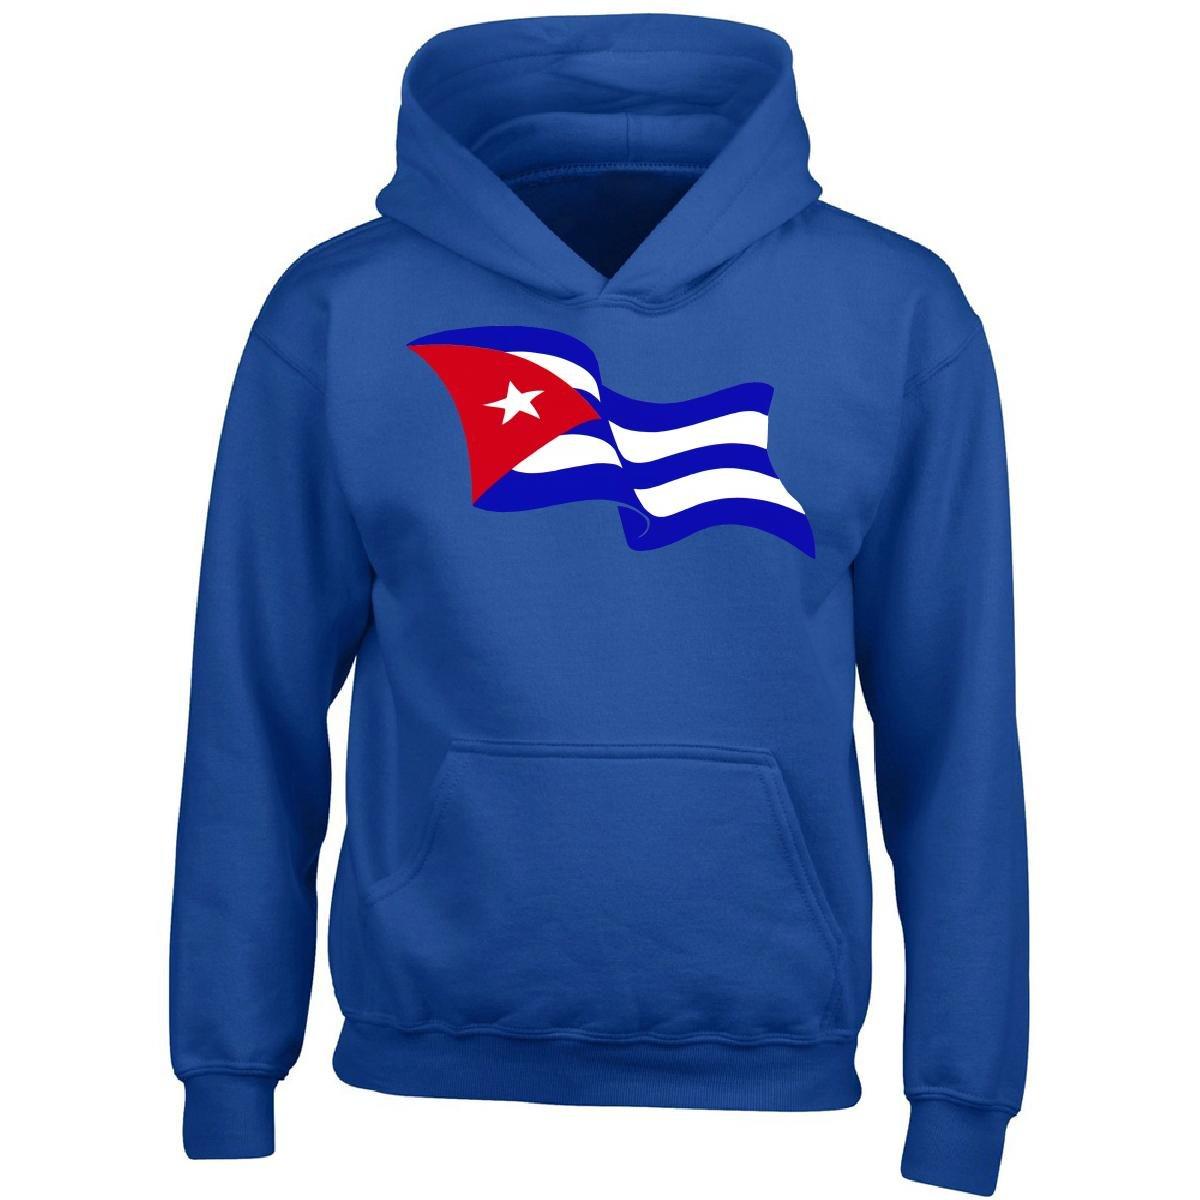 Latin America Focus Cuba Flag Windy Cuban Bandera Gift - Boy Boys Hoodie Kids XL Royal